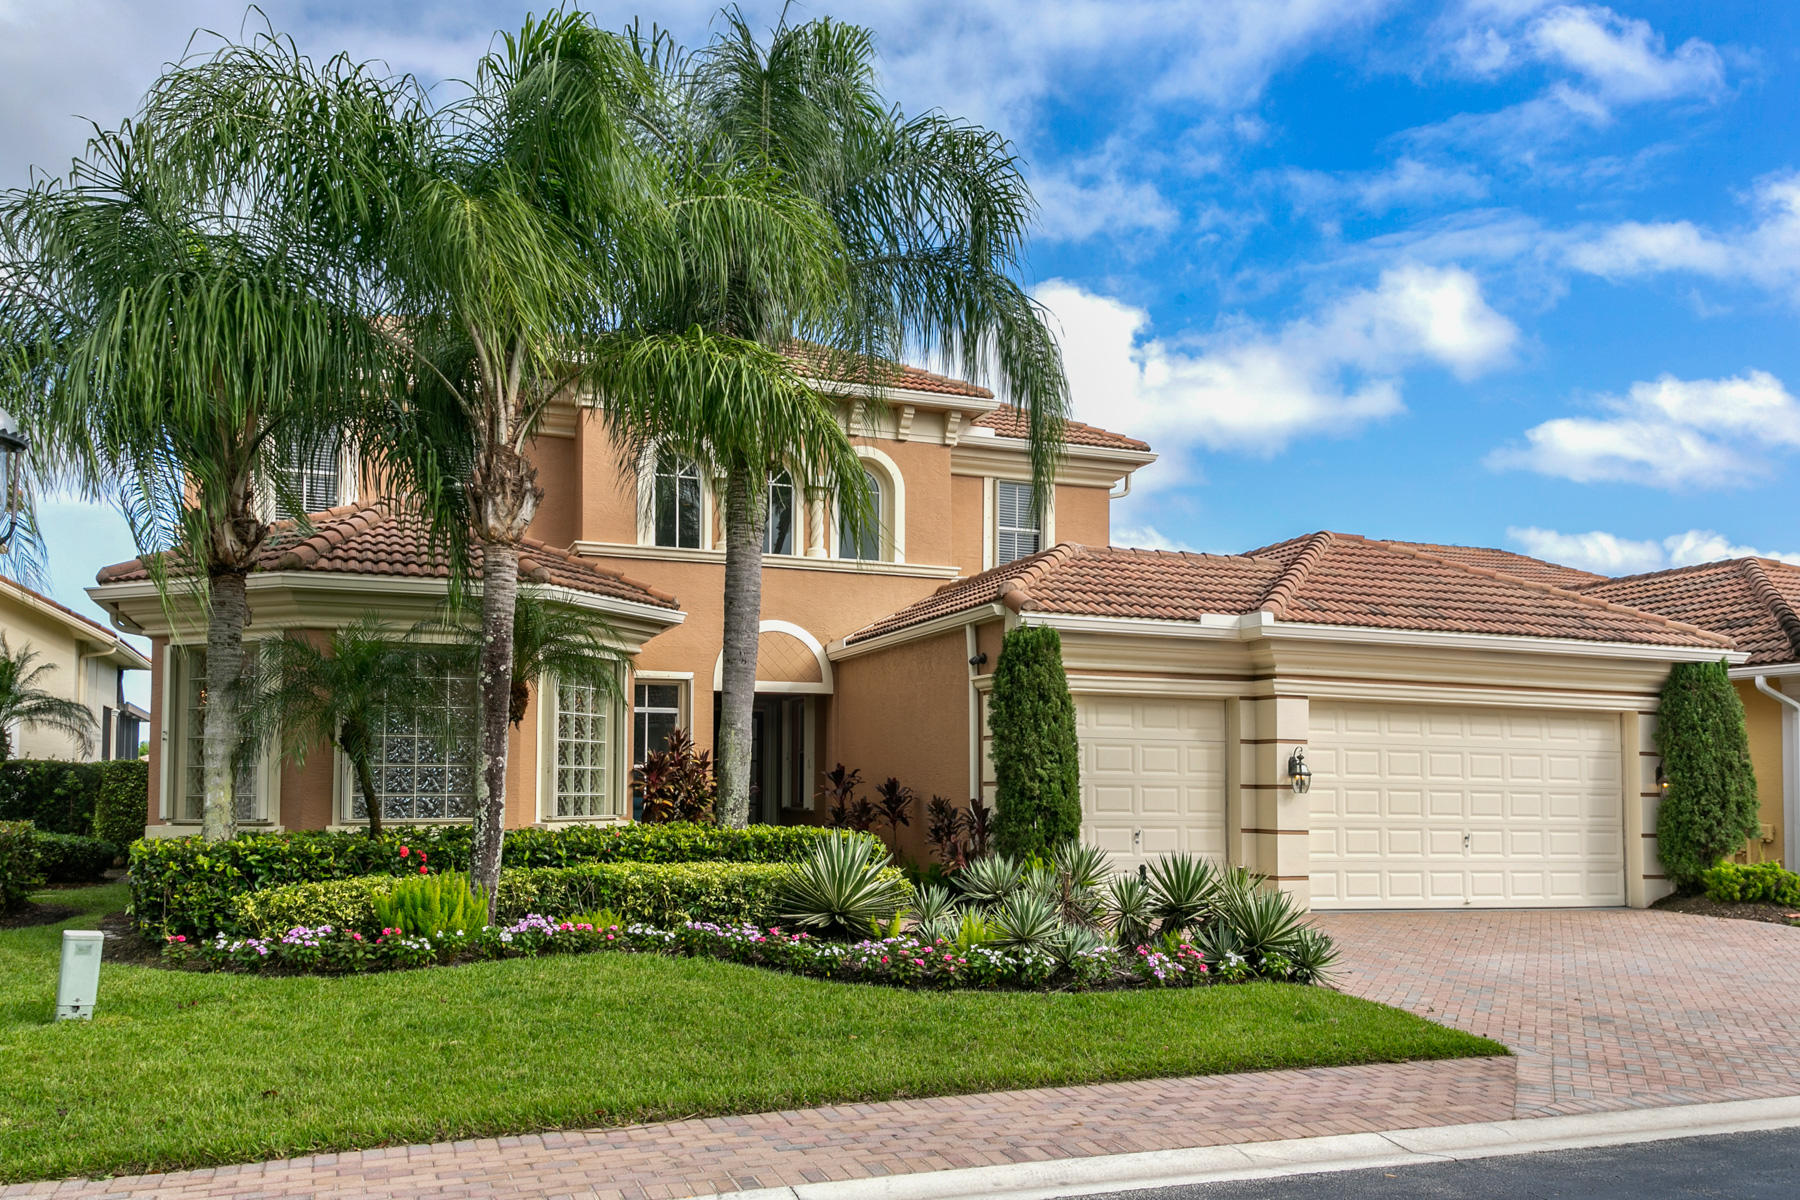 Details for 7460 Monte Verde Lane, West Palm Beach, FL 33412